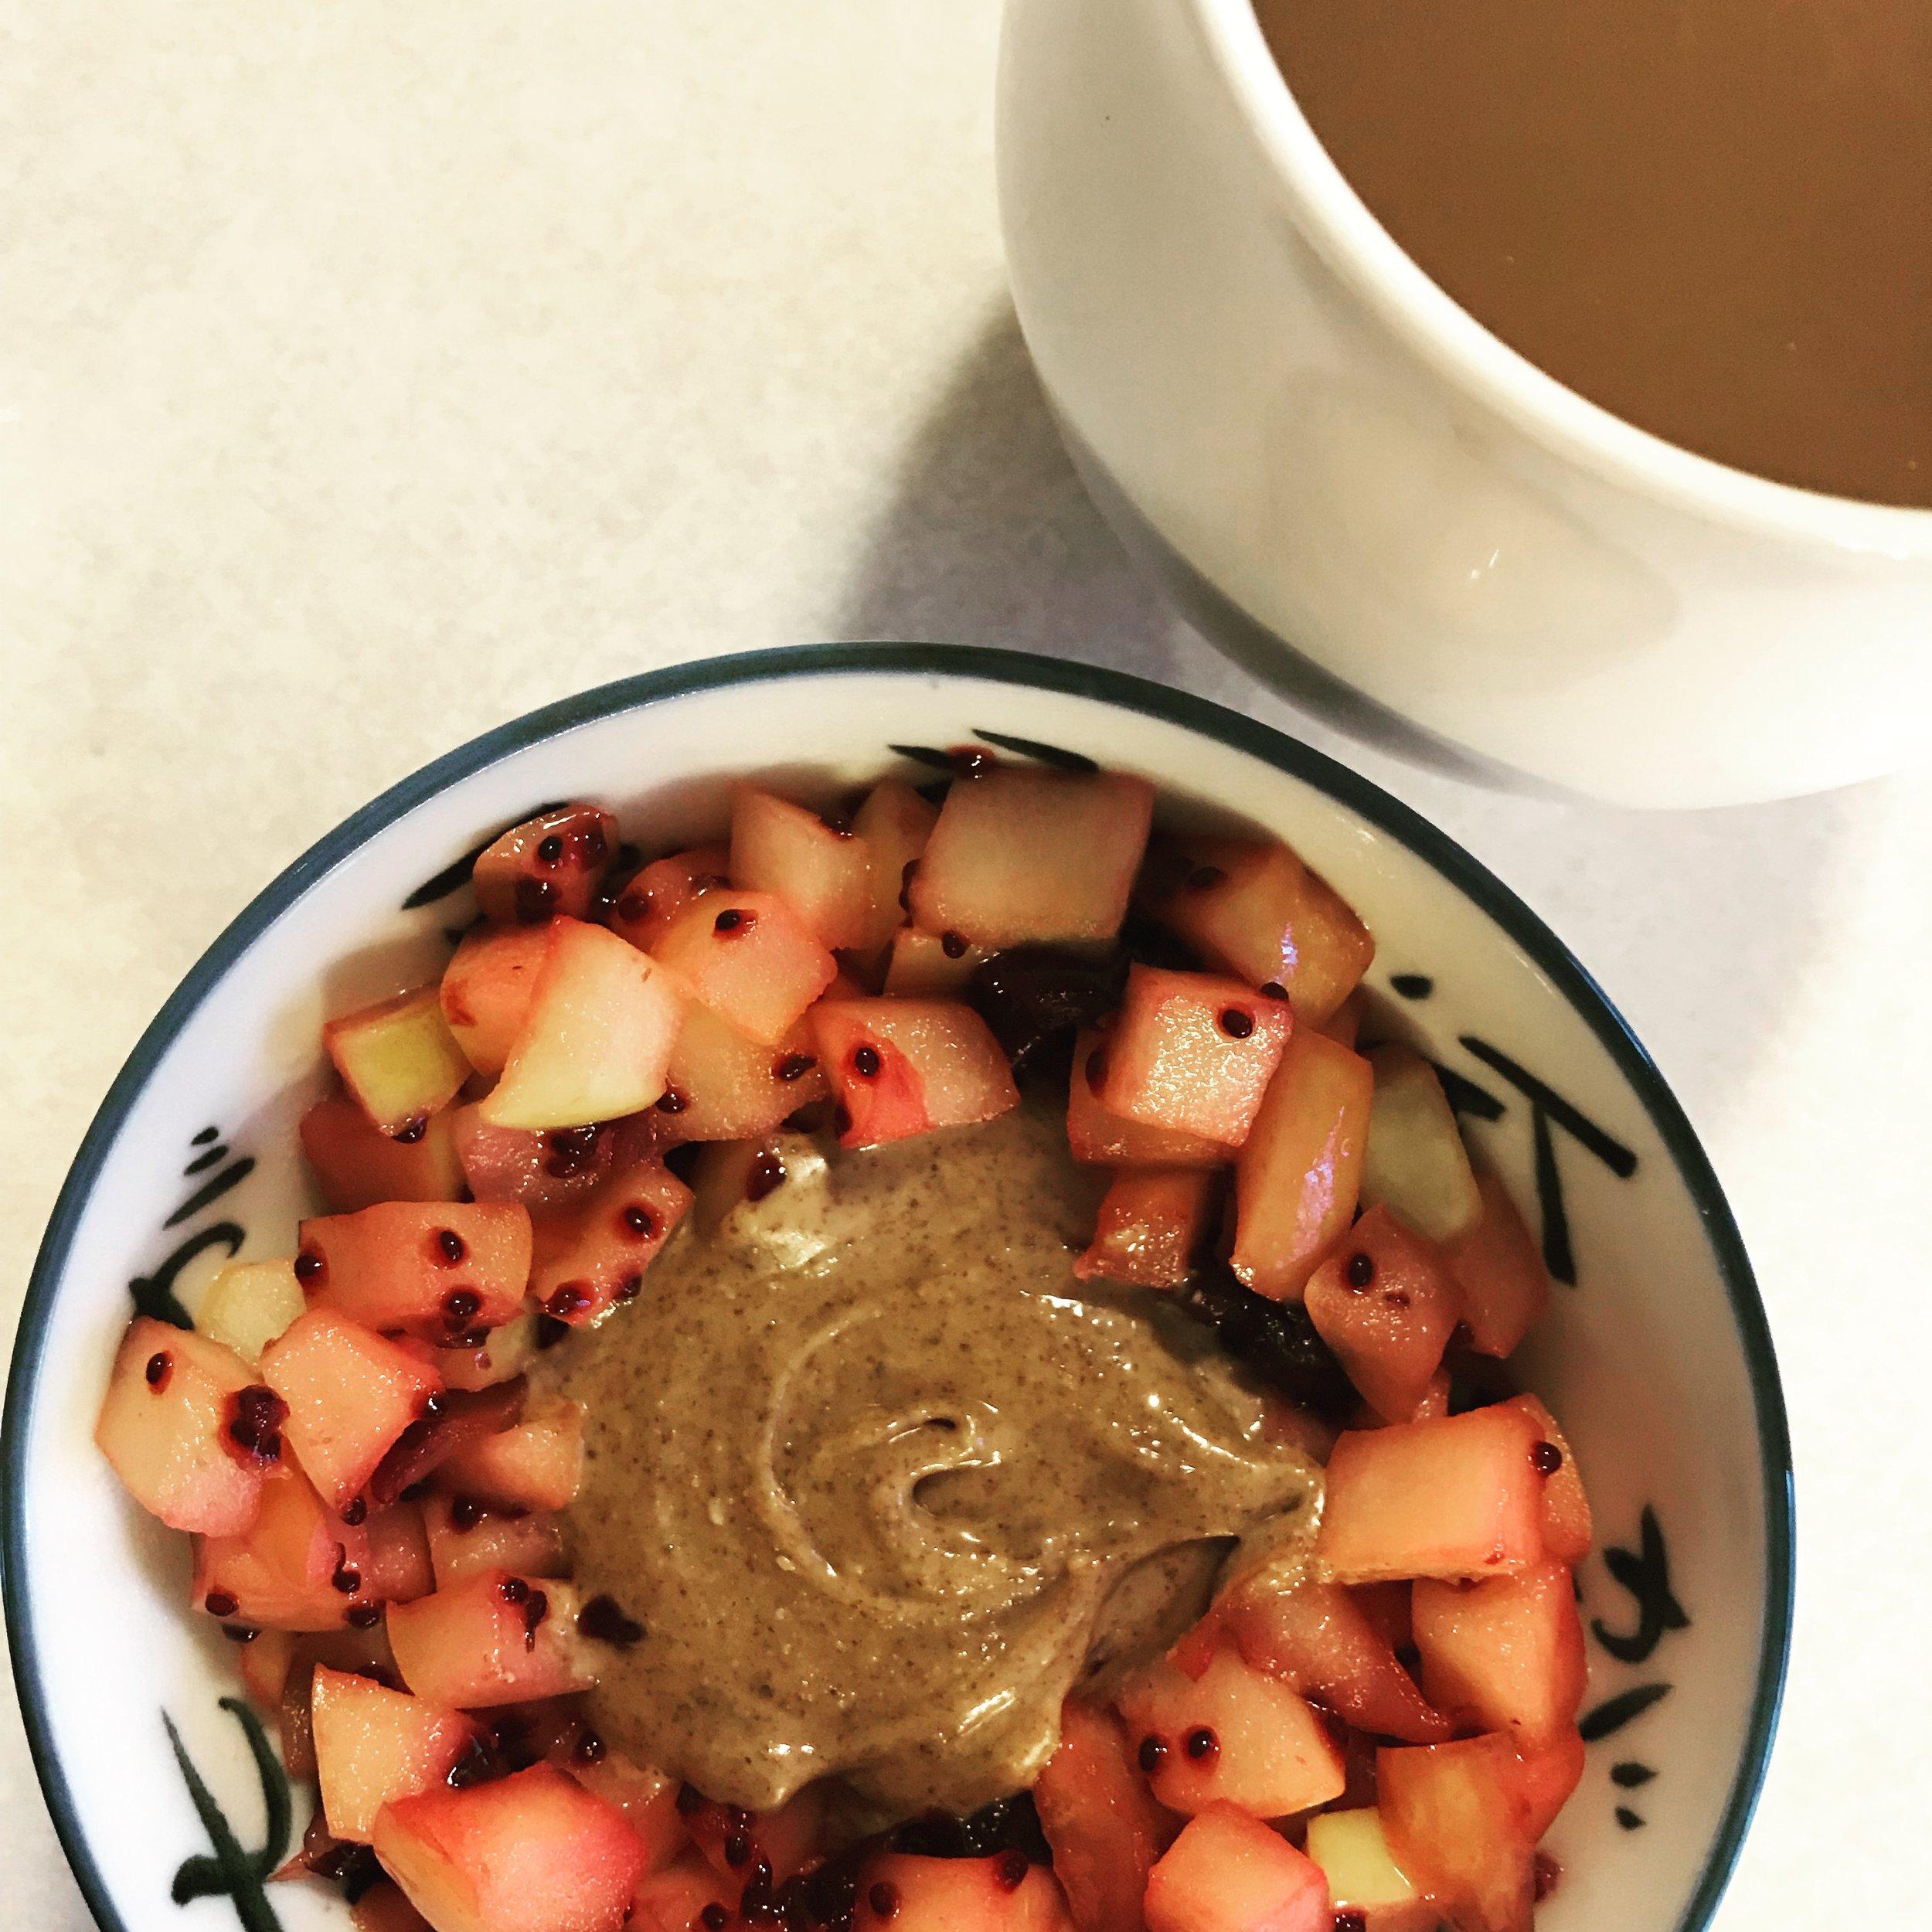 Sautéed Apples with Cherry Chia Jam